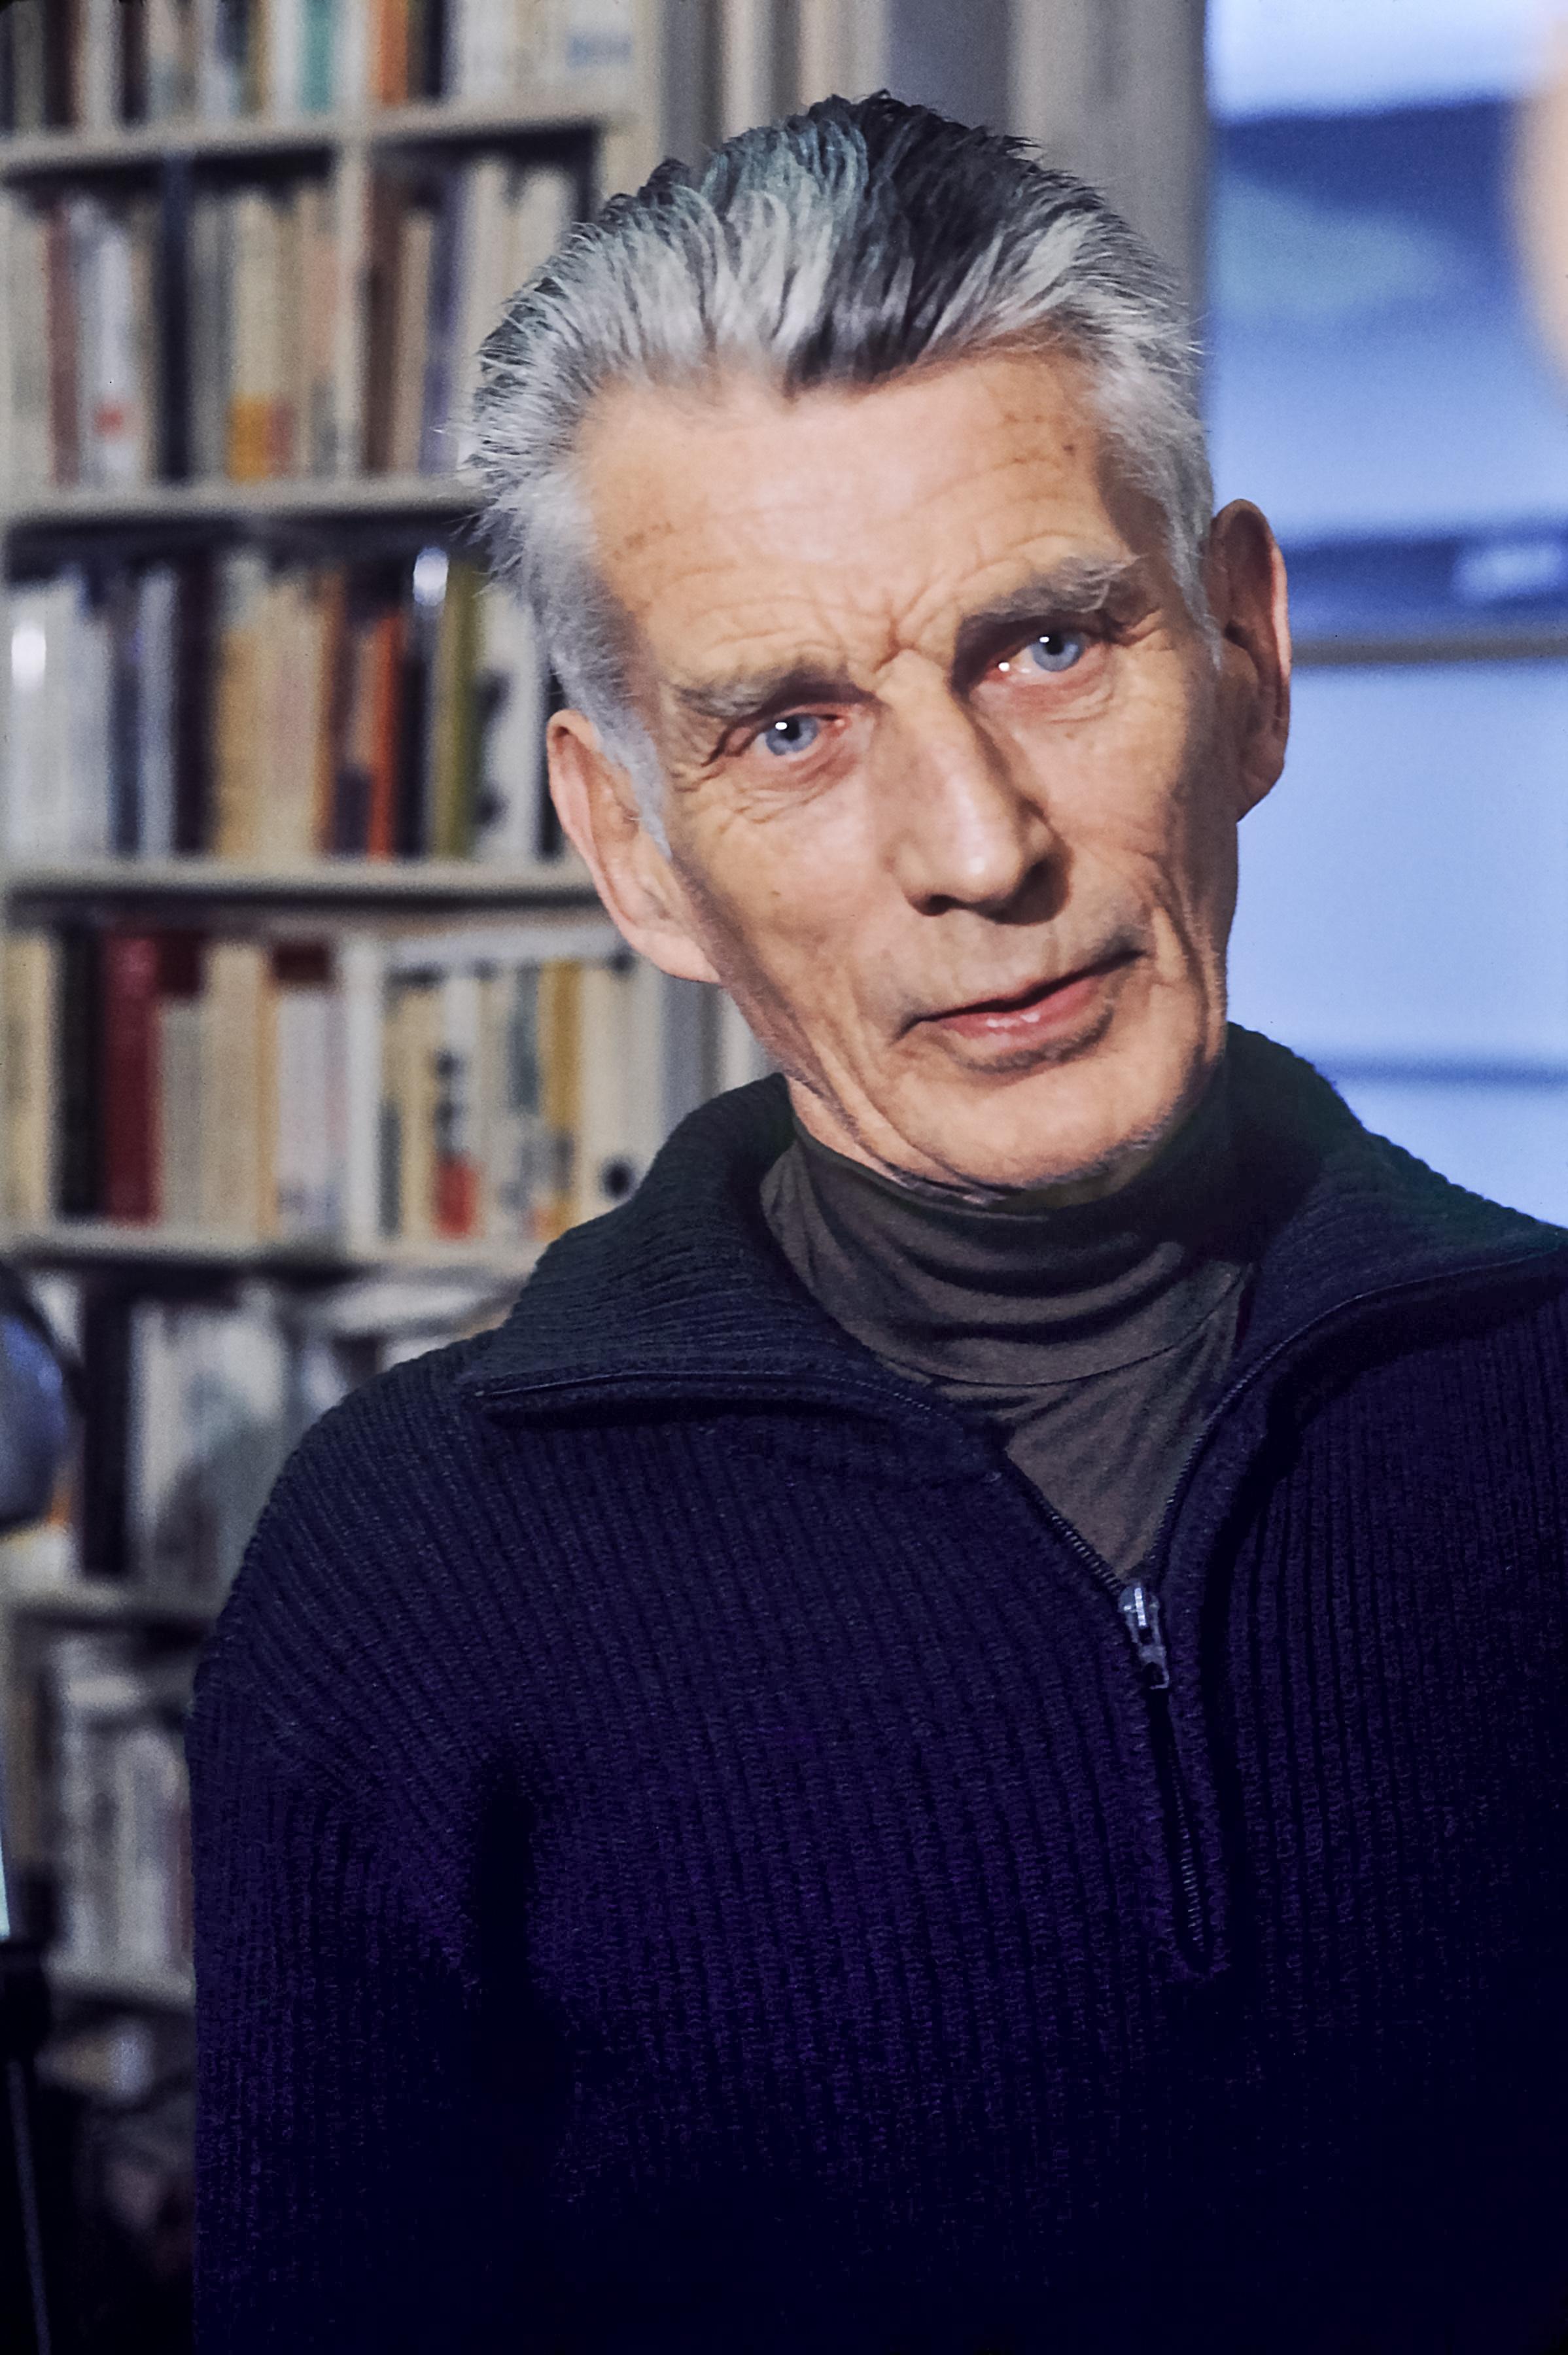 Photo Samuel Beckett via Opendata BNF